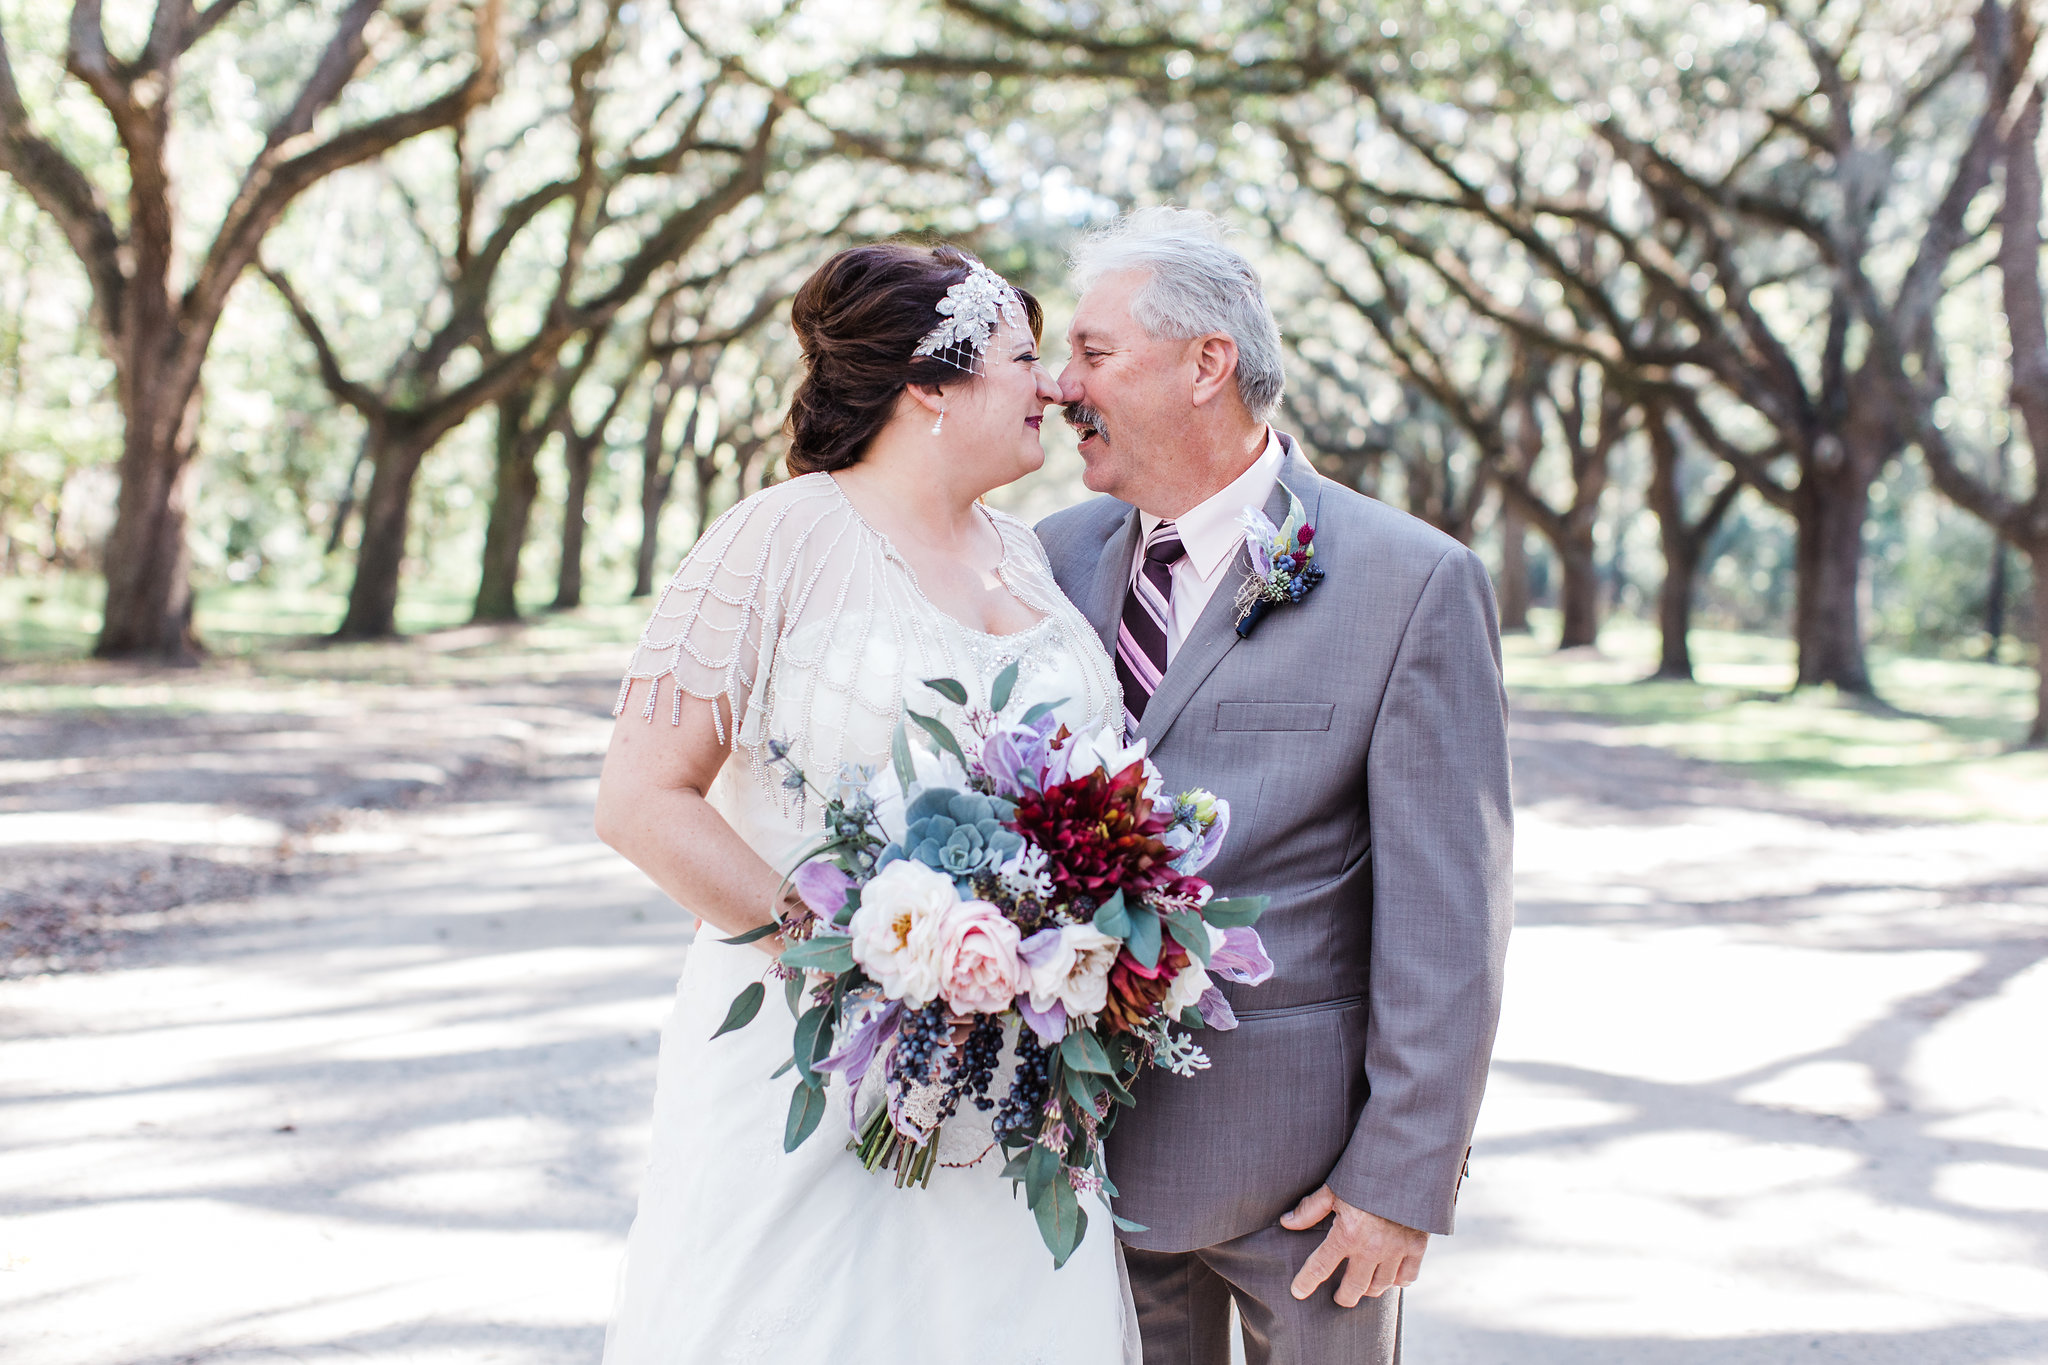 apt-b-photography-kristy-rob-wormsloe-elopment-savannah-wedding-photographer-savannah-elopement-wormsloe-wedding-historic-savannah-elopement-photographer-23.jpg